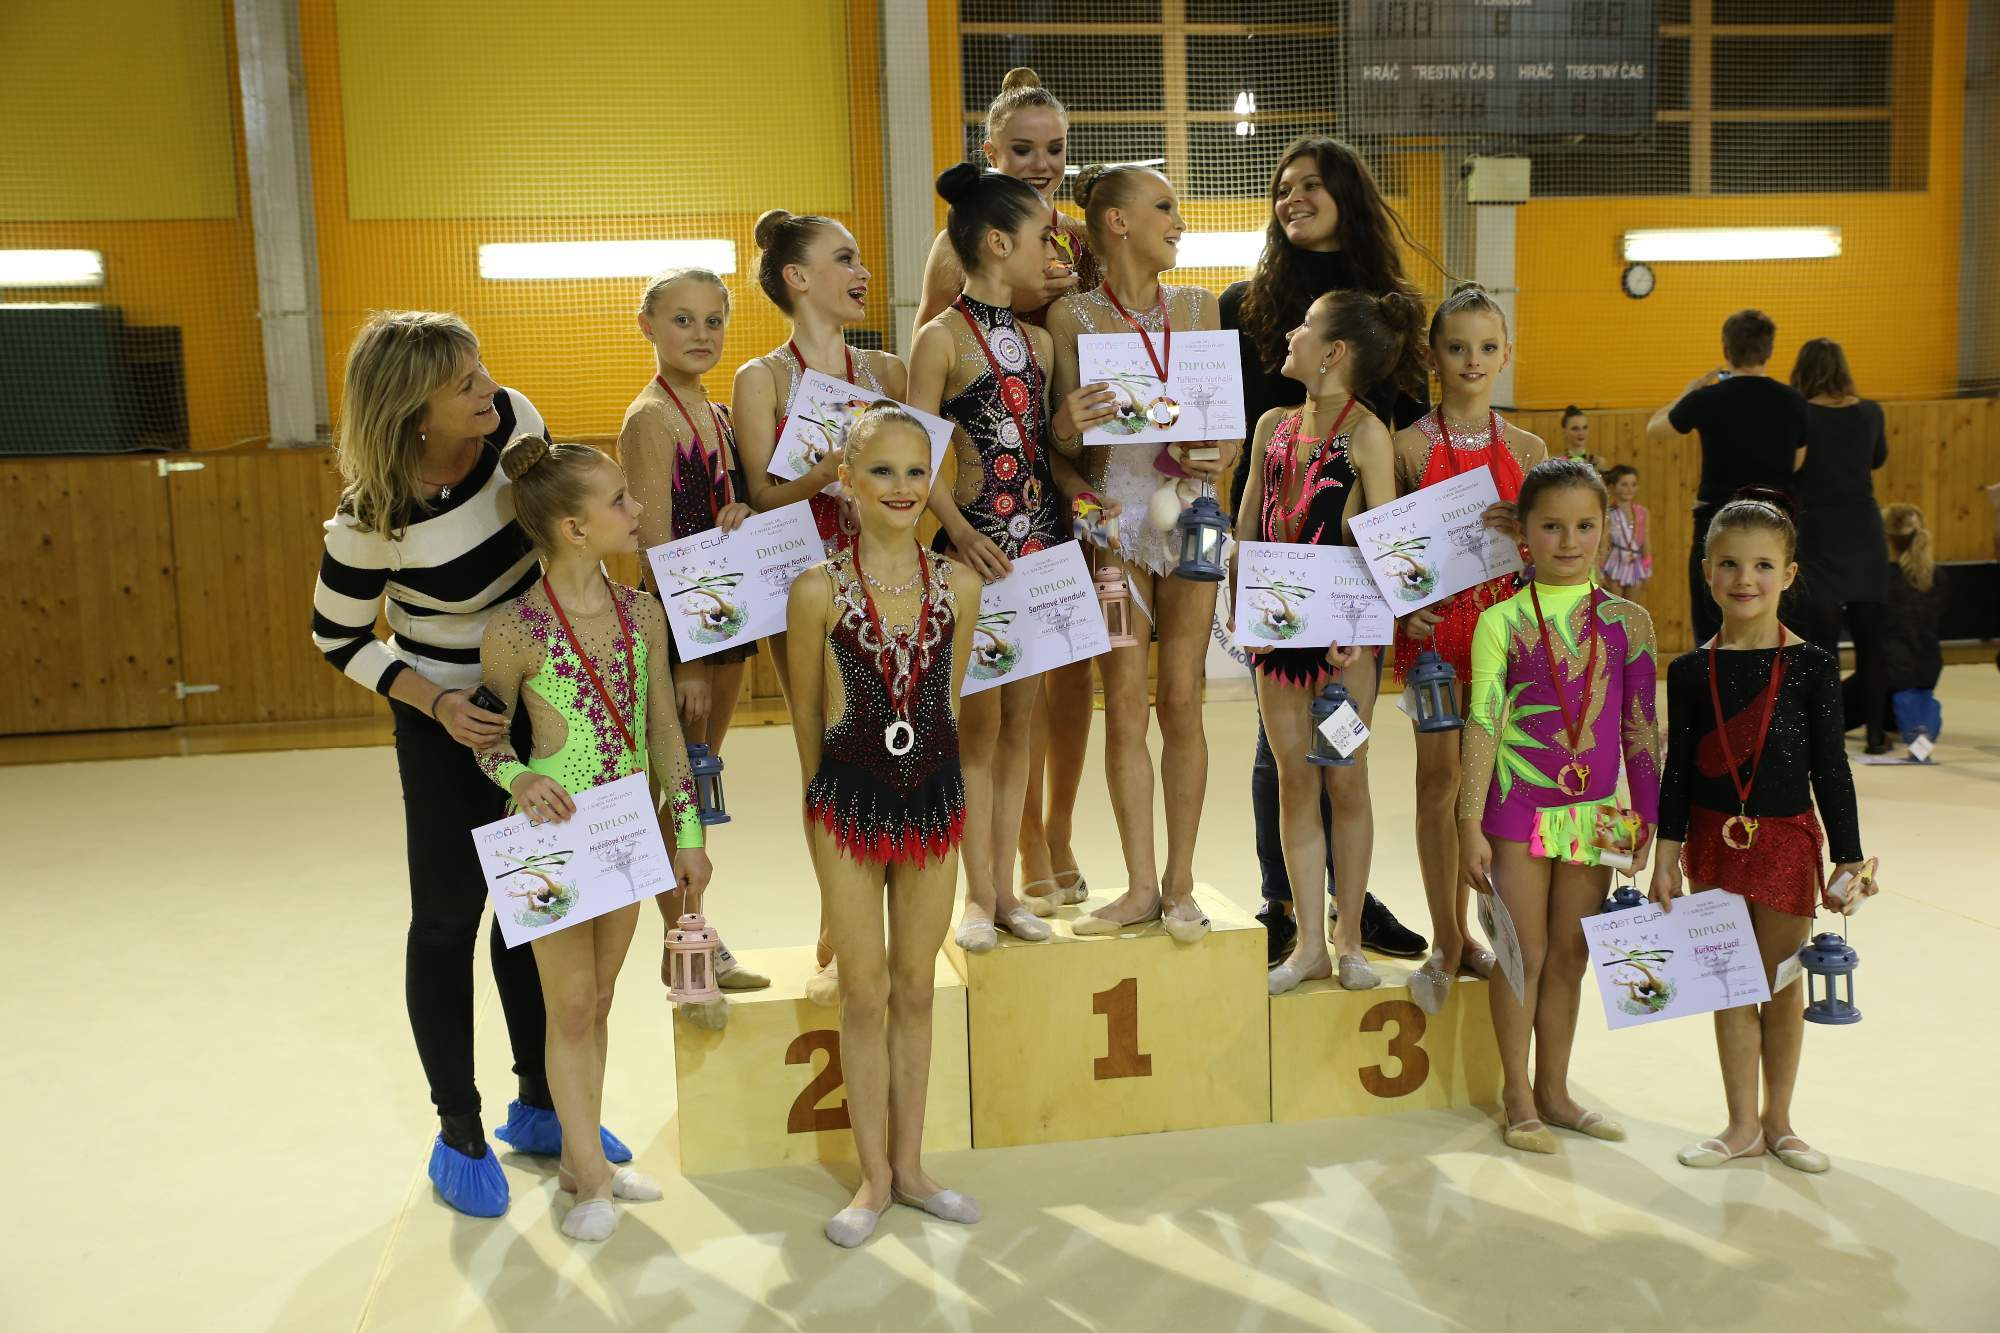 http://gymnastika-hk.cz//public/galerie/fotoalbum/Monet_Cup_Praha/IMG_0478